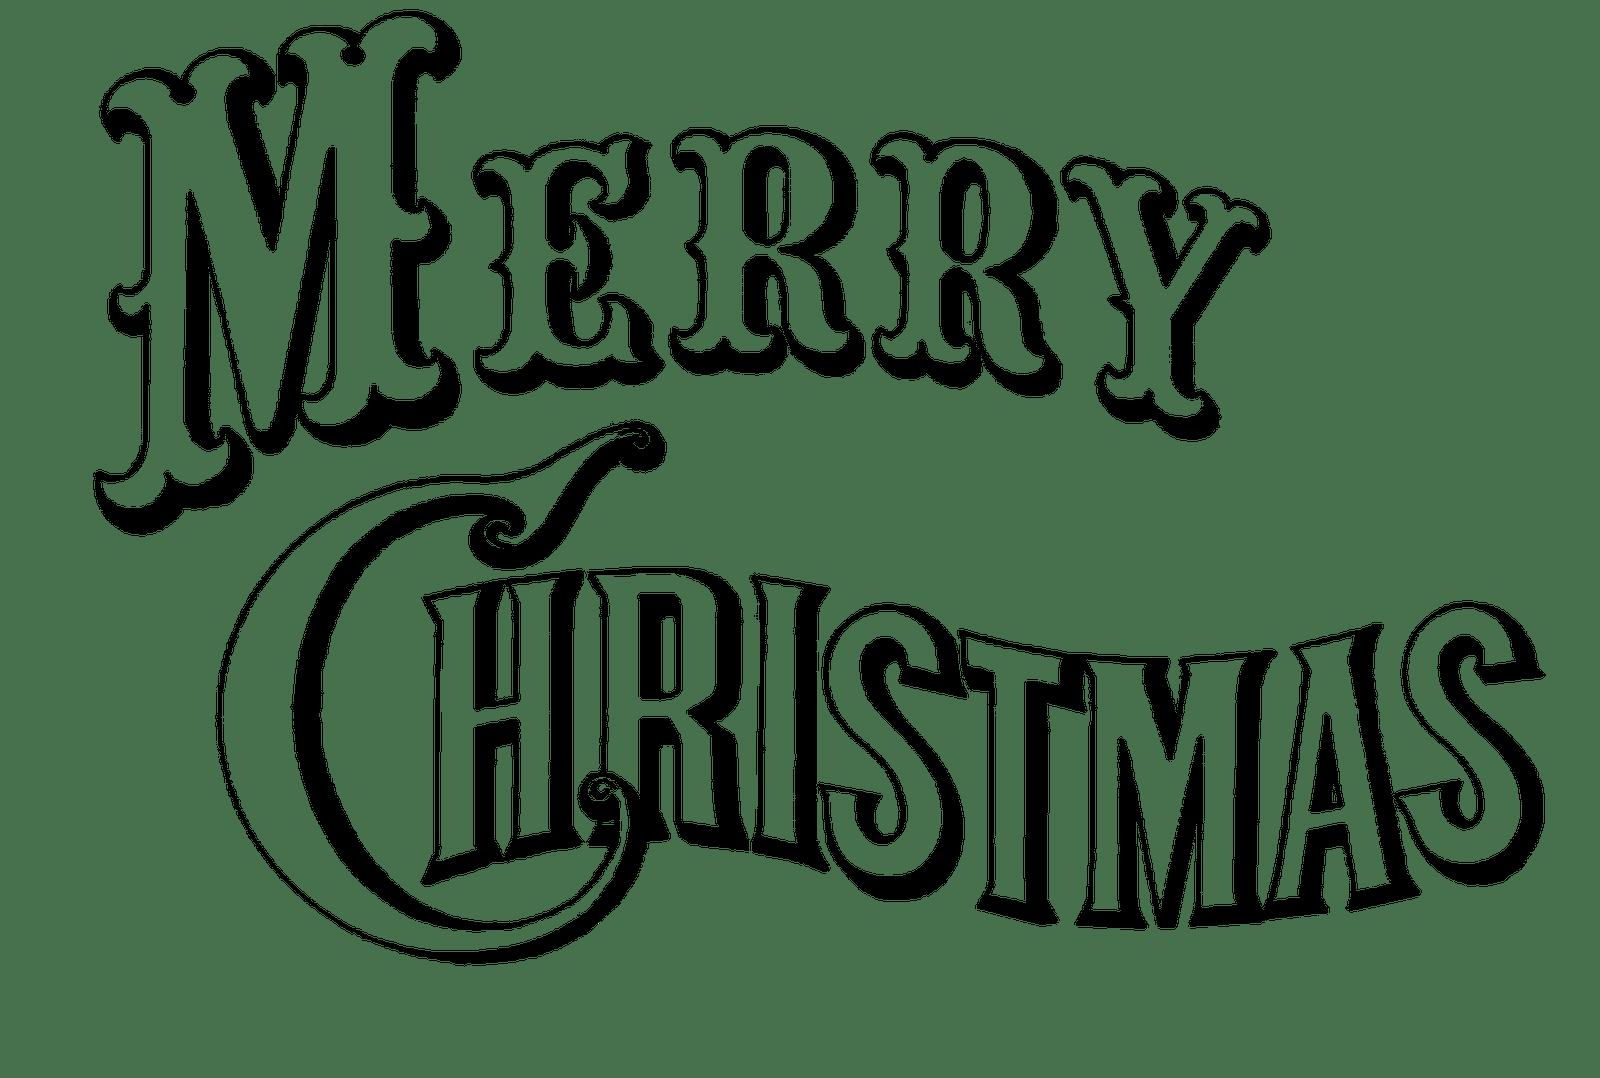 Merry Christmas Clip Art Words Clipart Panda